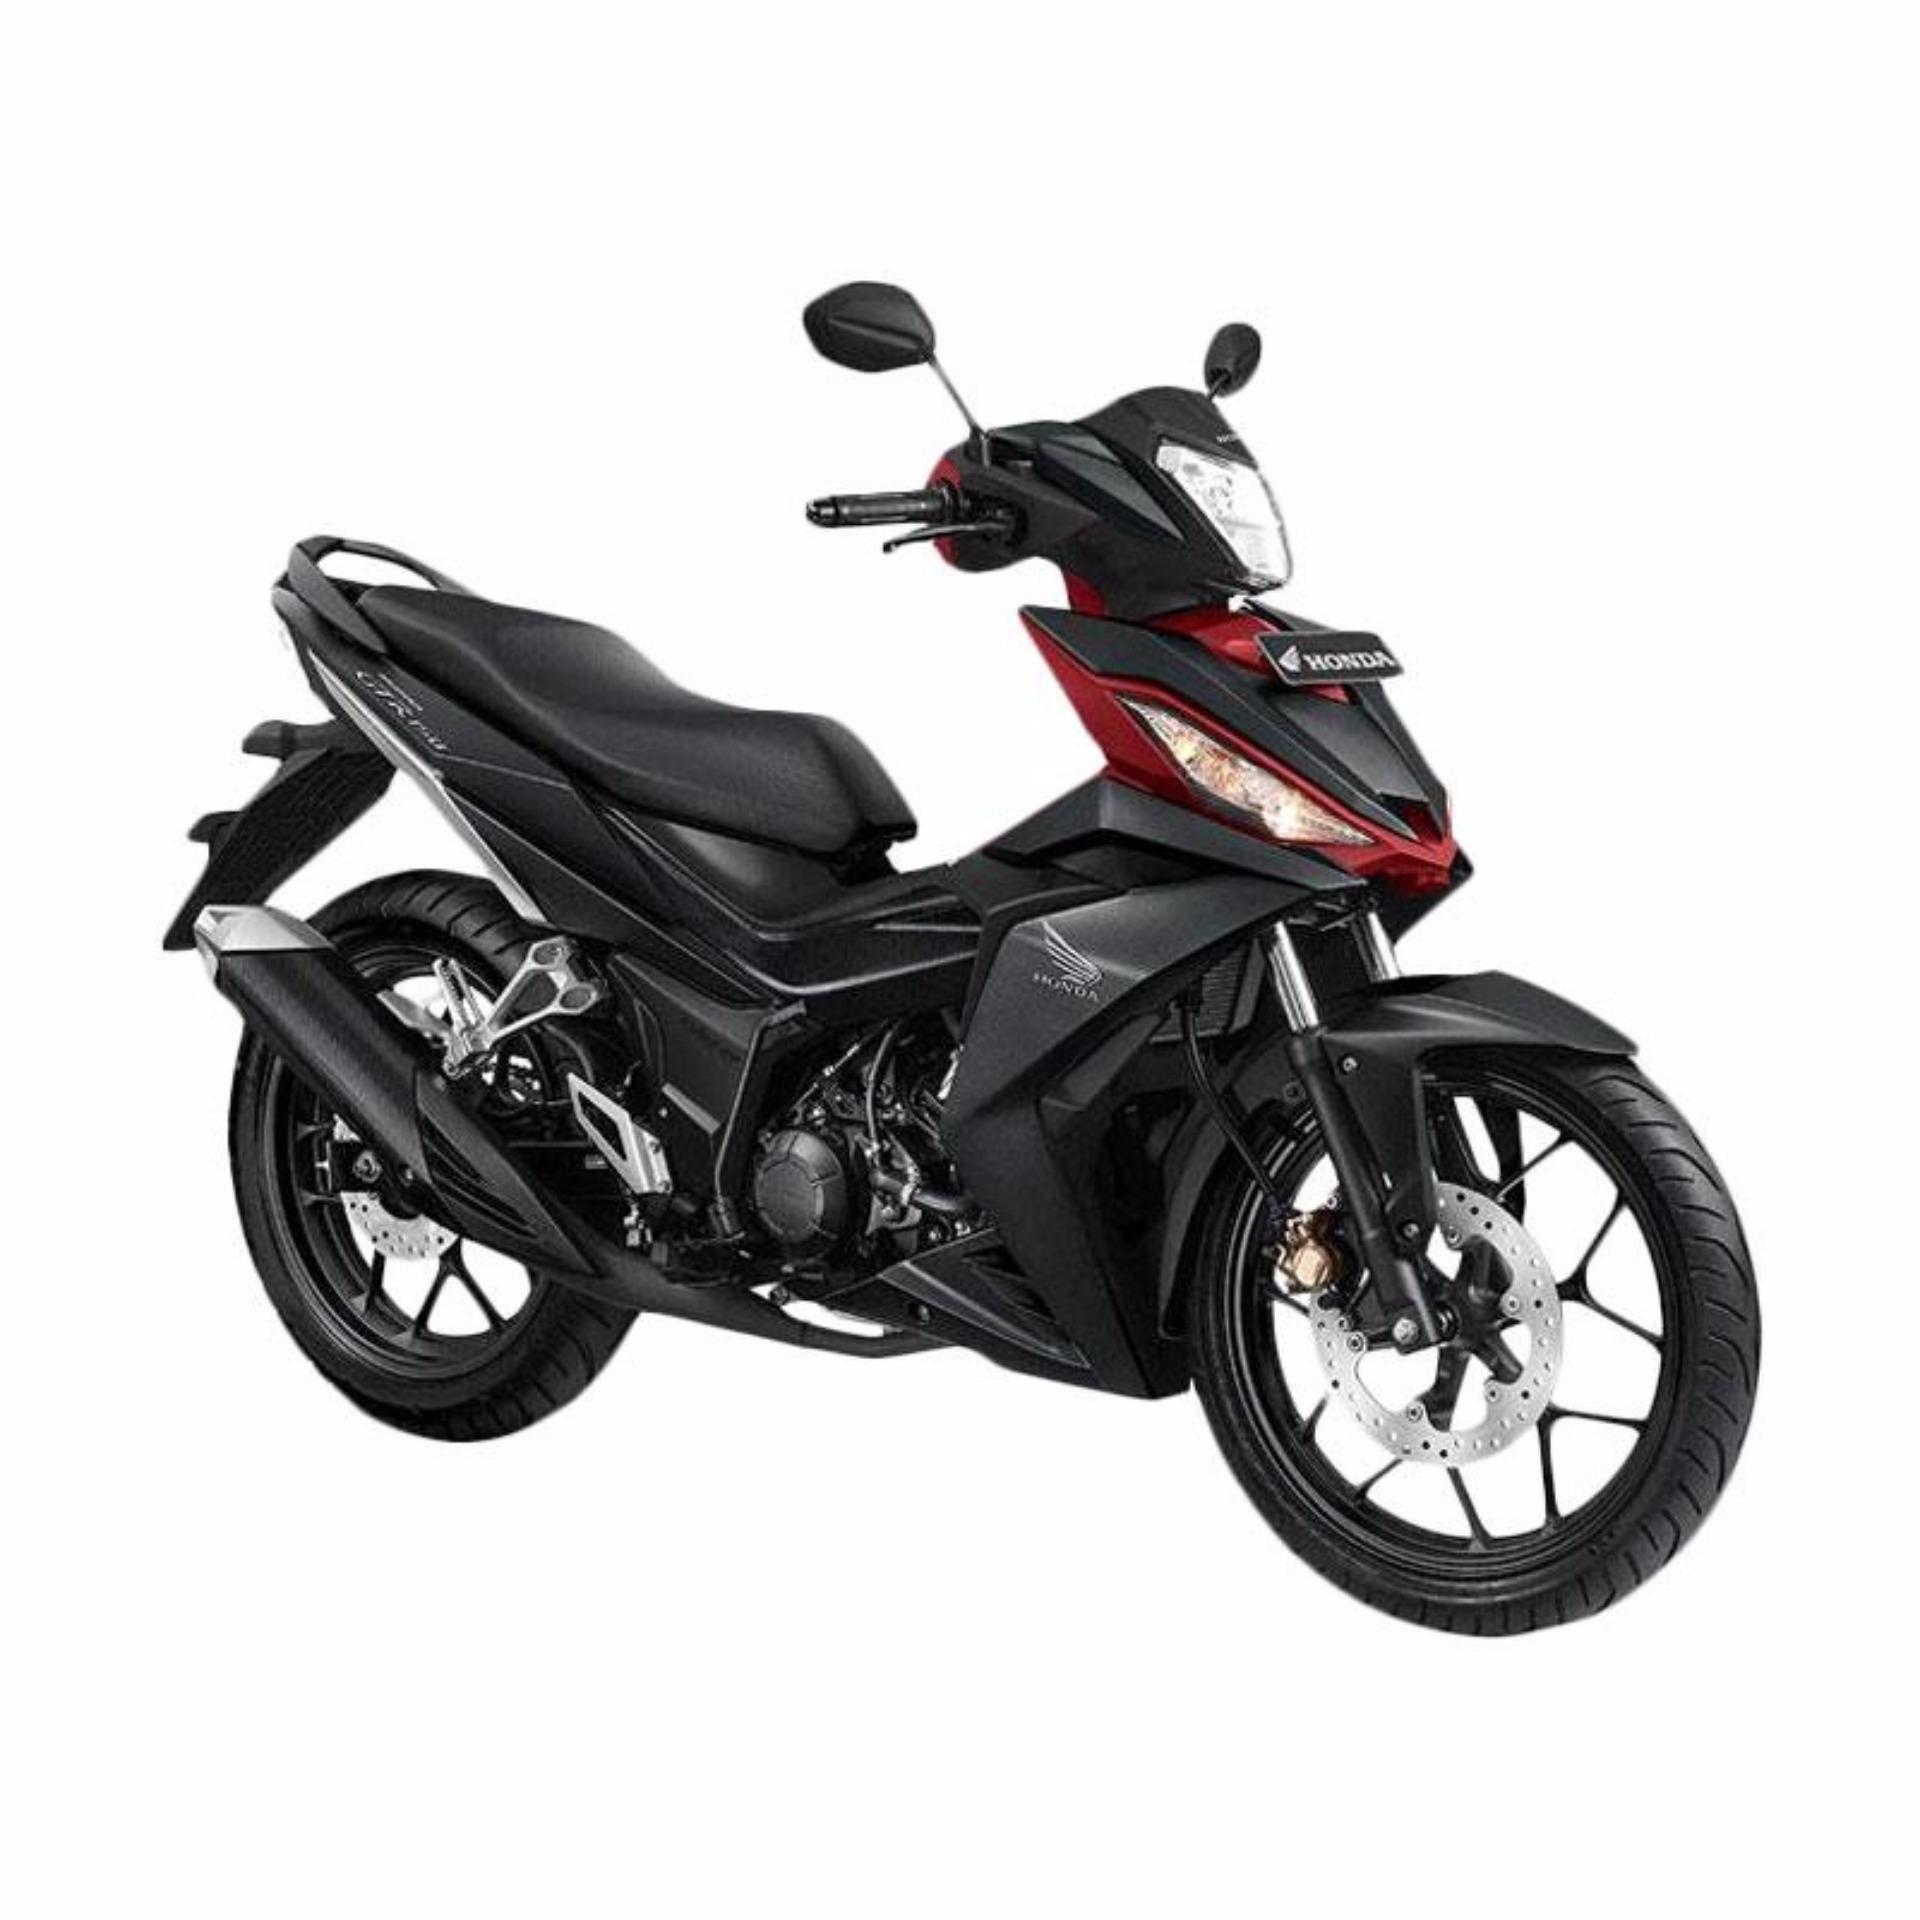 ... BeAT eSP CBS Funk Red White BPRALSALAAM. Source · Flash Sale Honda New Supra GTR 150 Exclusive Gun Black - OTR Daerah Istimewa Yogyakarta